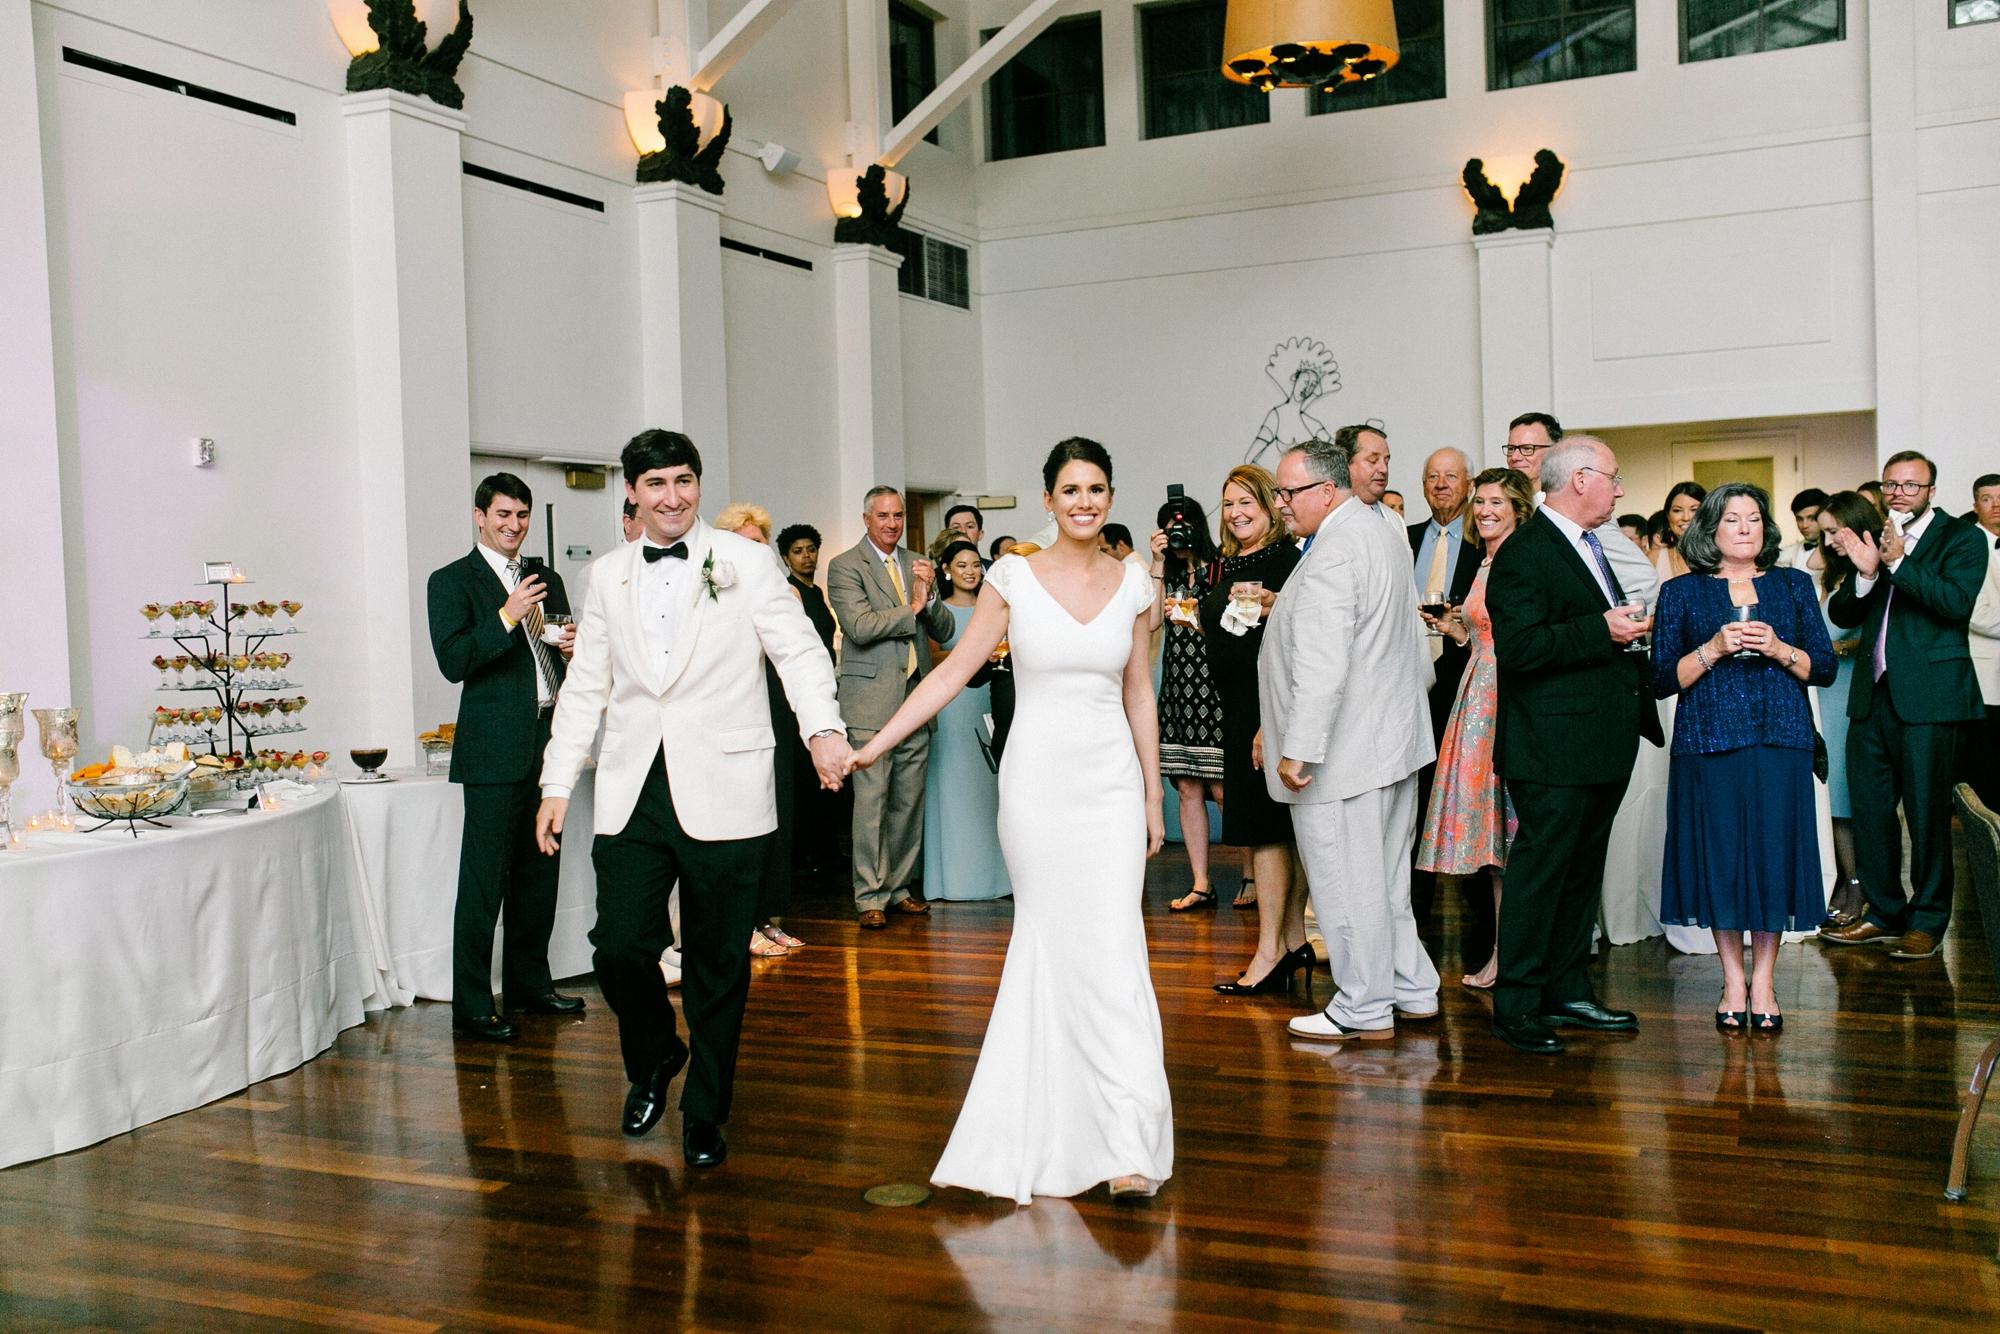 New_Orleans_Wedding_Photographer_0893.jpg